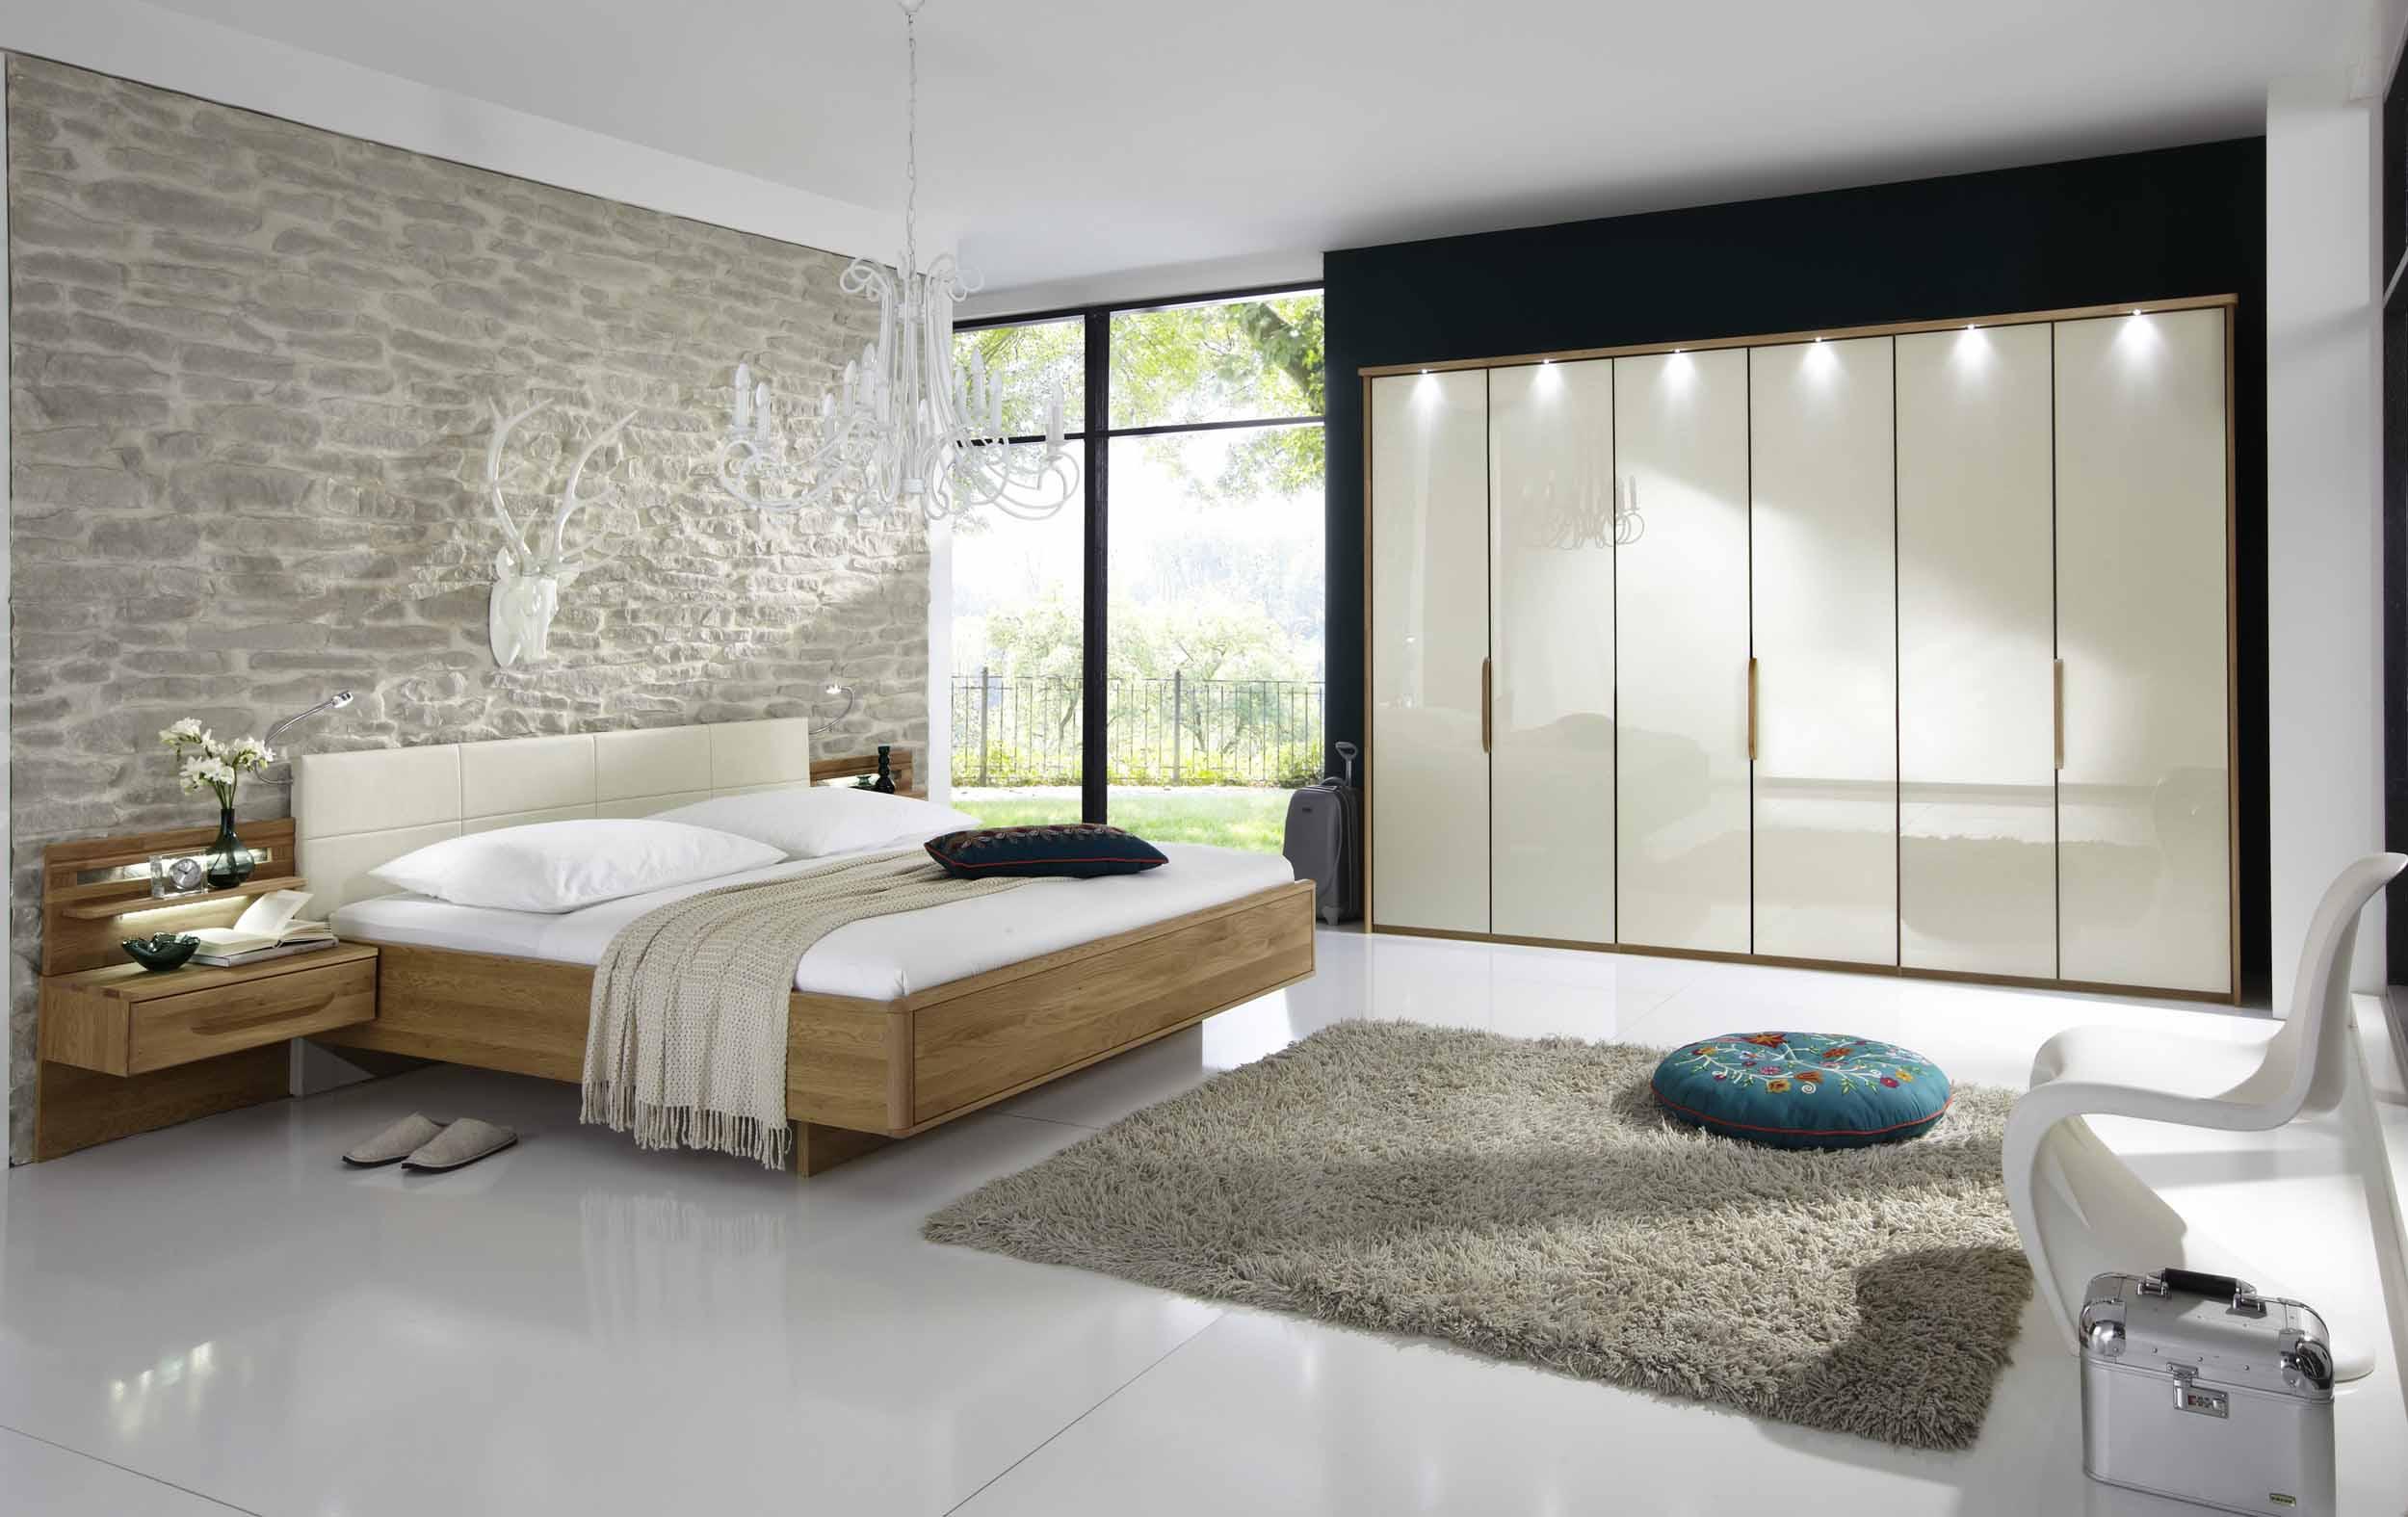 schlafzimmer torino eiche glas magnolie g nstig massiva. Black Bedroom Furniture Sets. Home Design Ideas